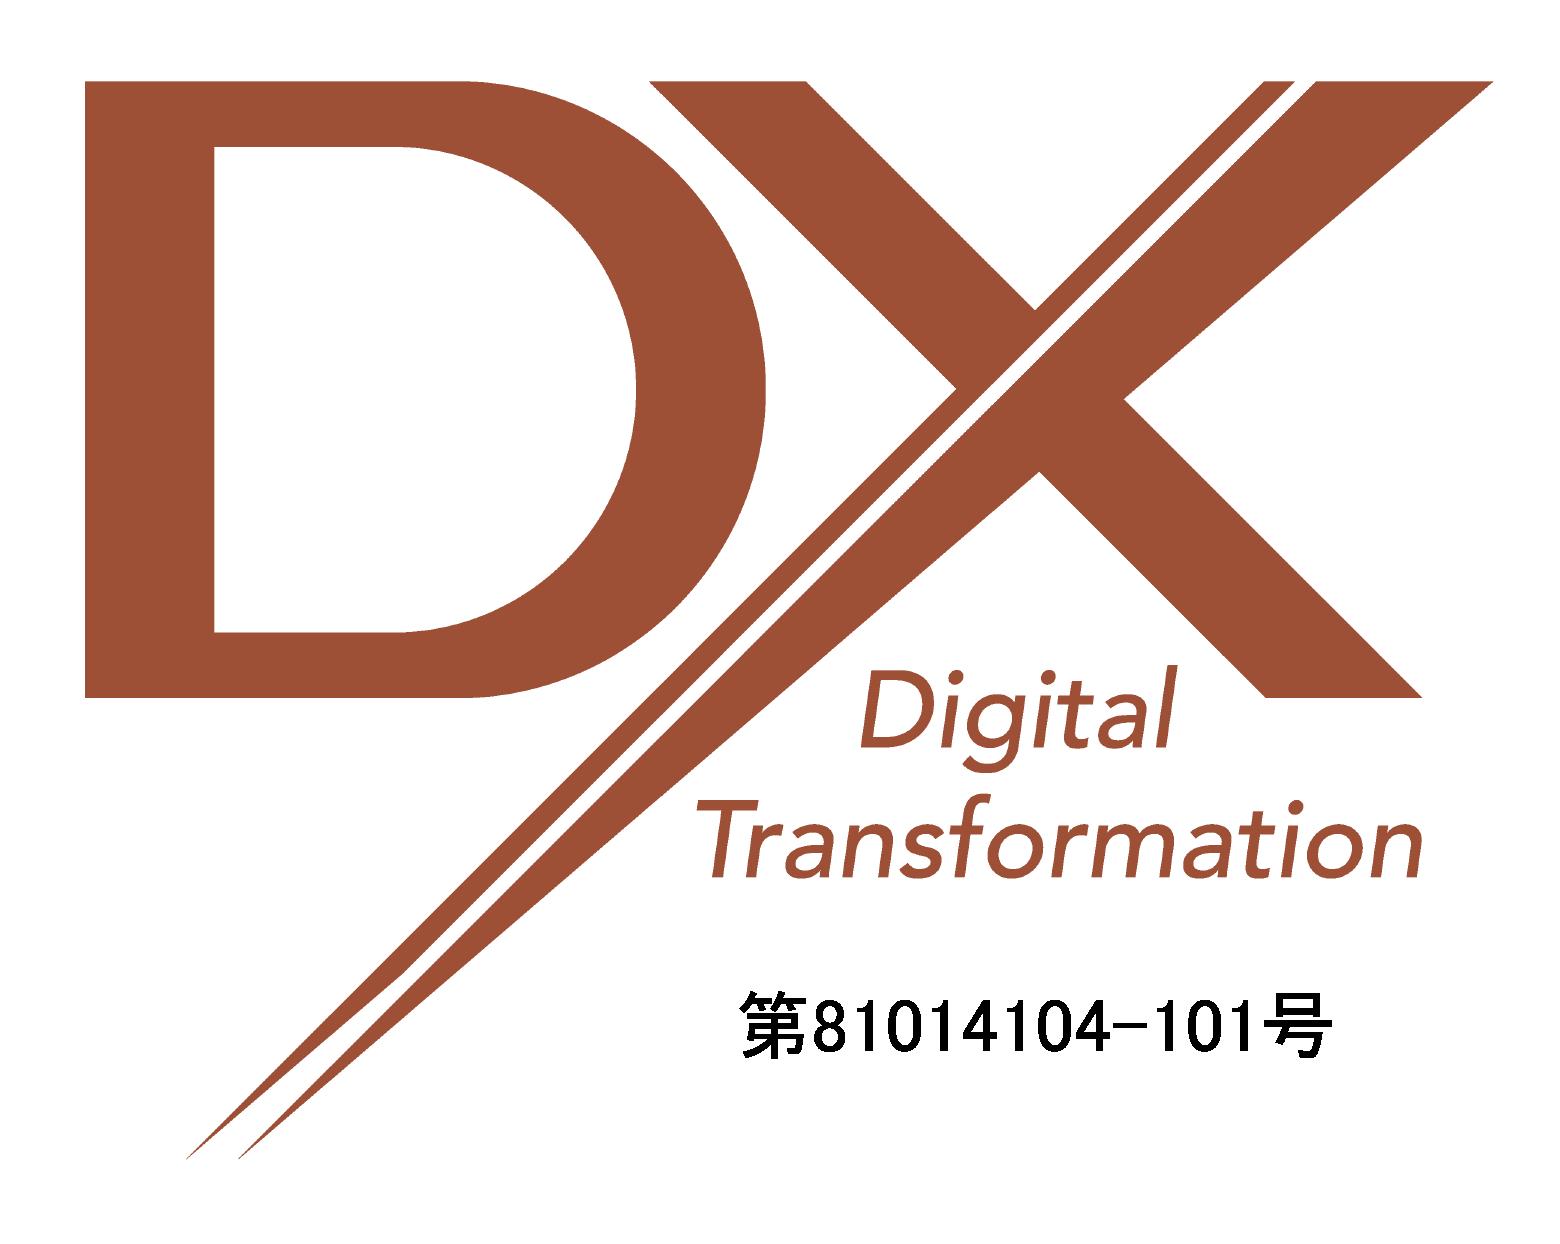 「DXマーク認証制度」のブロンズ認証